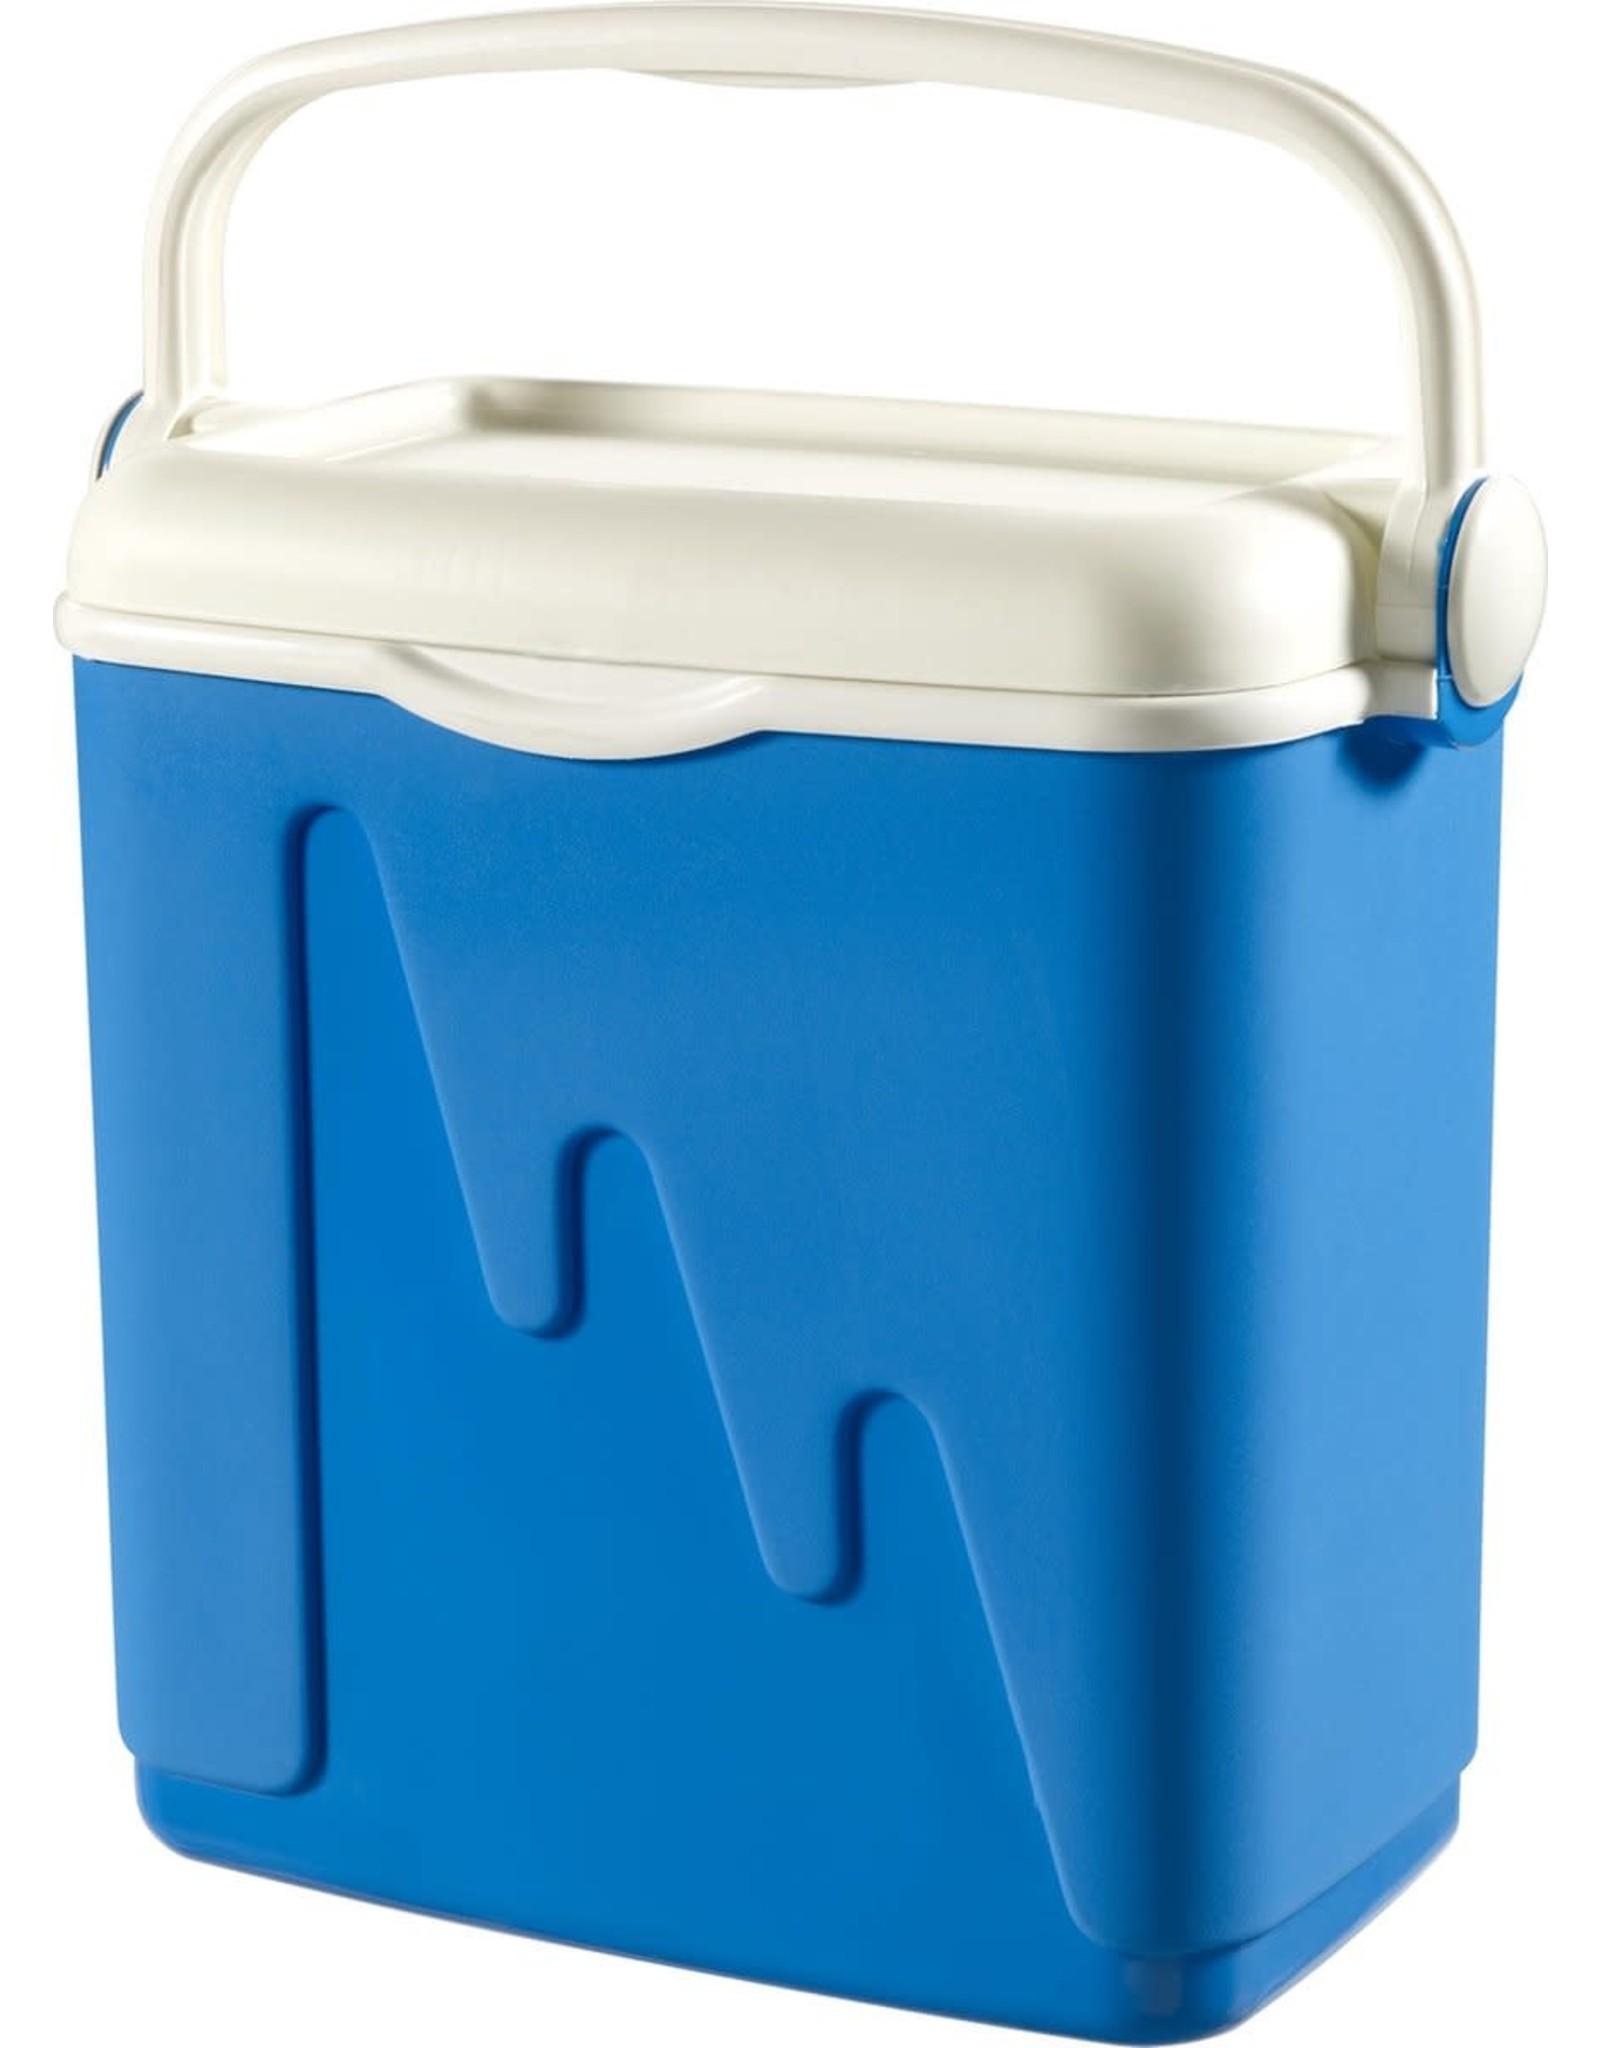 CURVER curver koelbox 20L